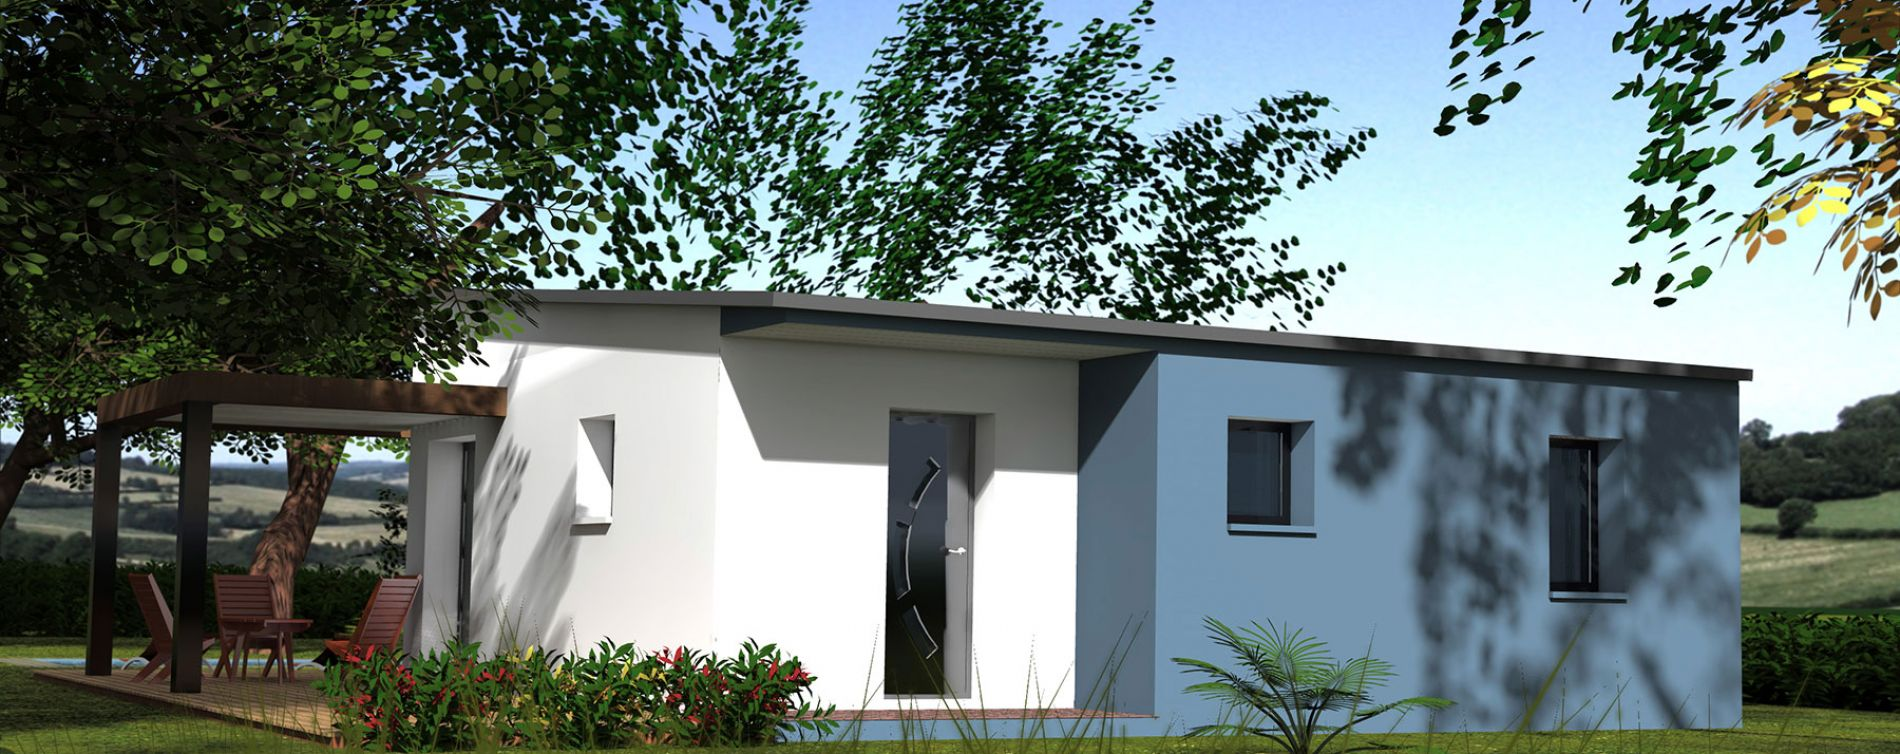 Lesneven : programme immobilier neuve « Pen Ar C'Hoat » (4)